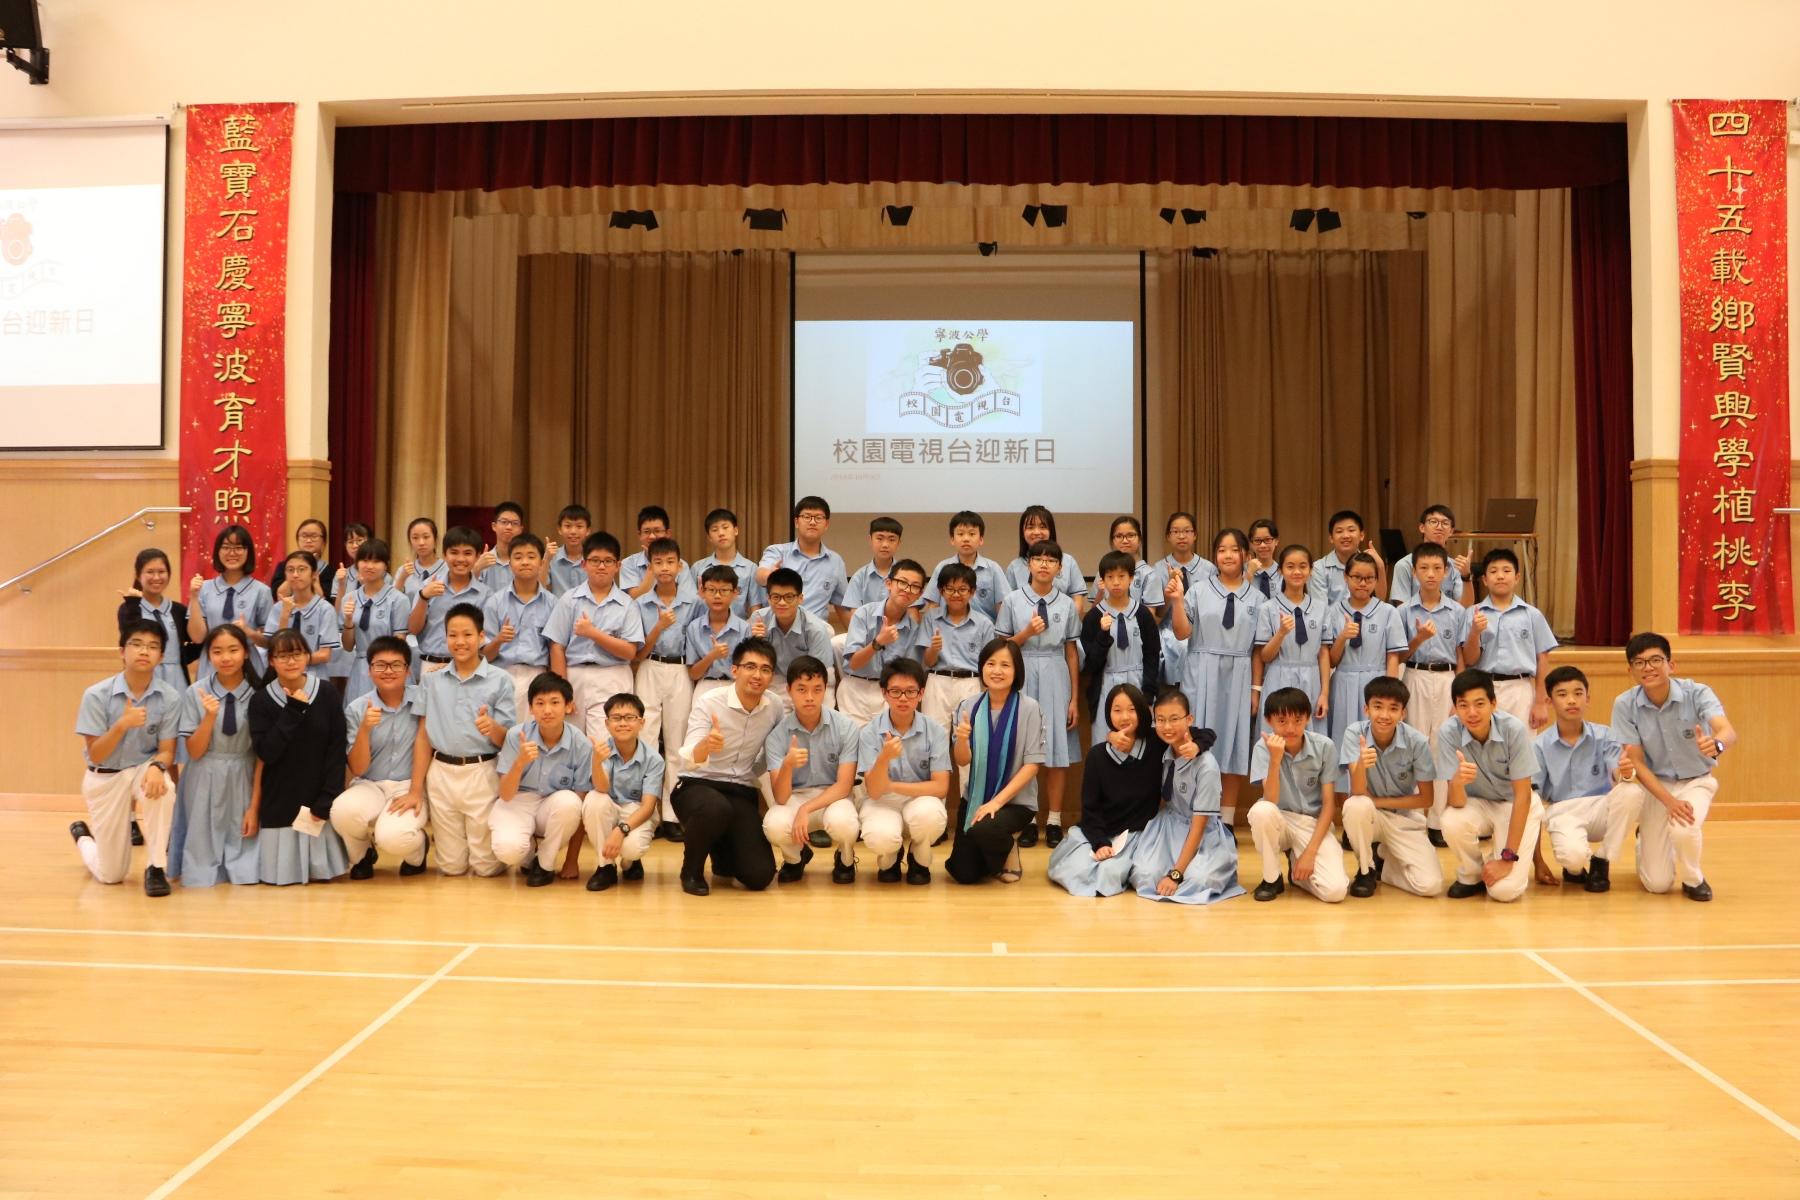 http://npc.edu.hk/sites/default/files/img_9147.jpg